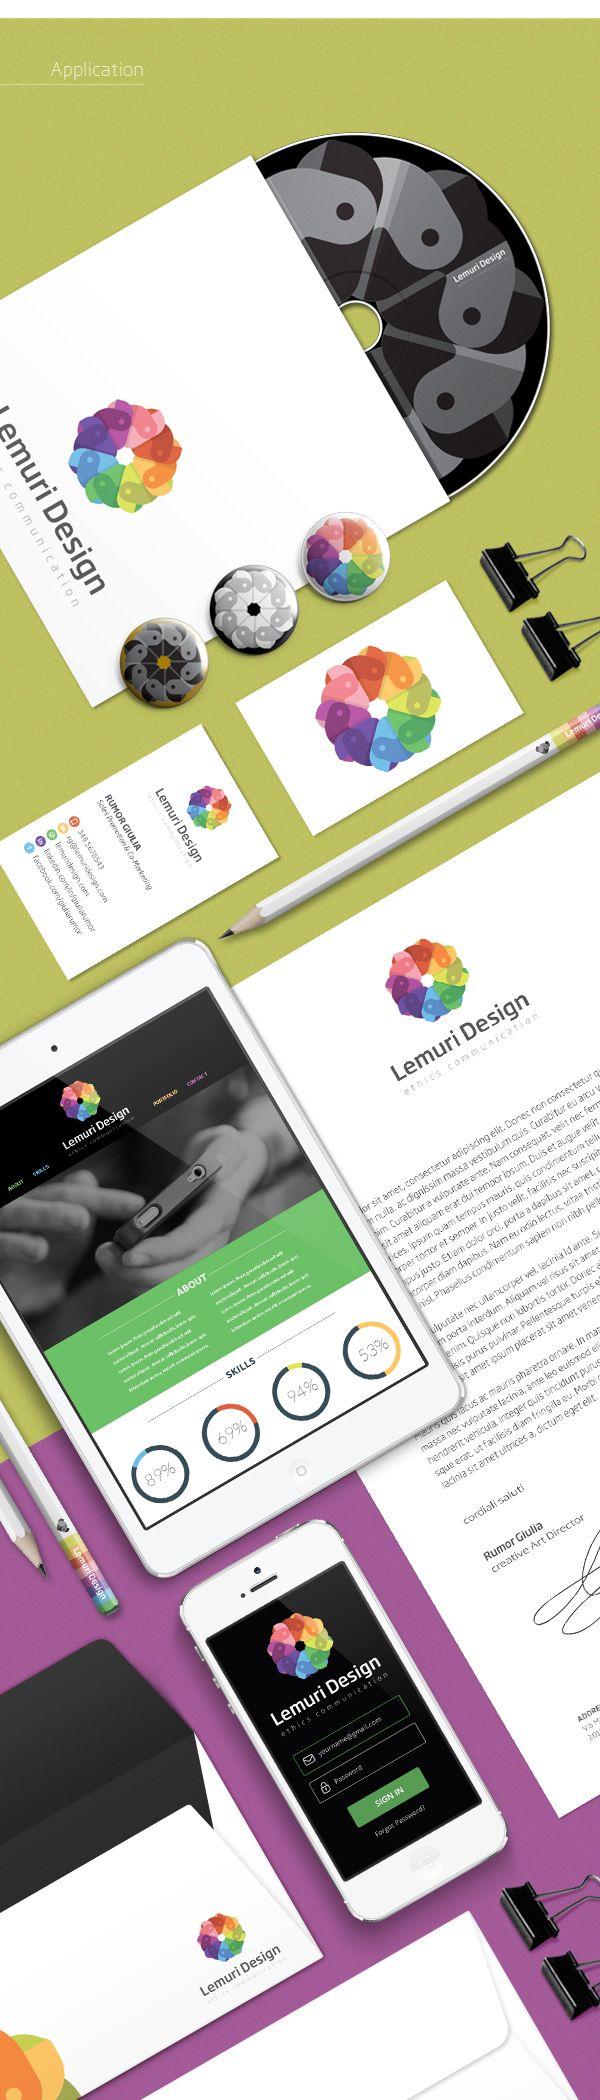 Applicazioni Lemuri Design